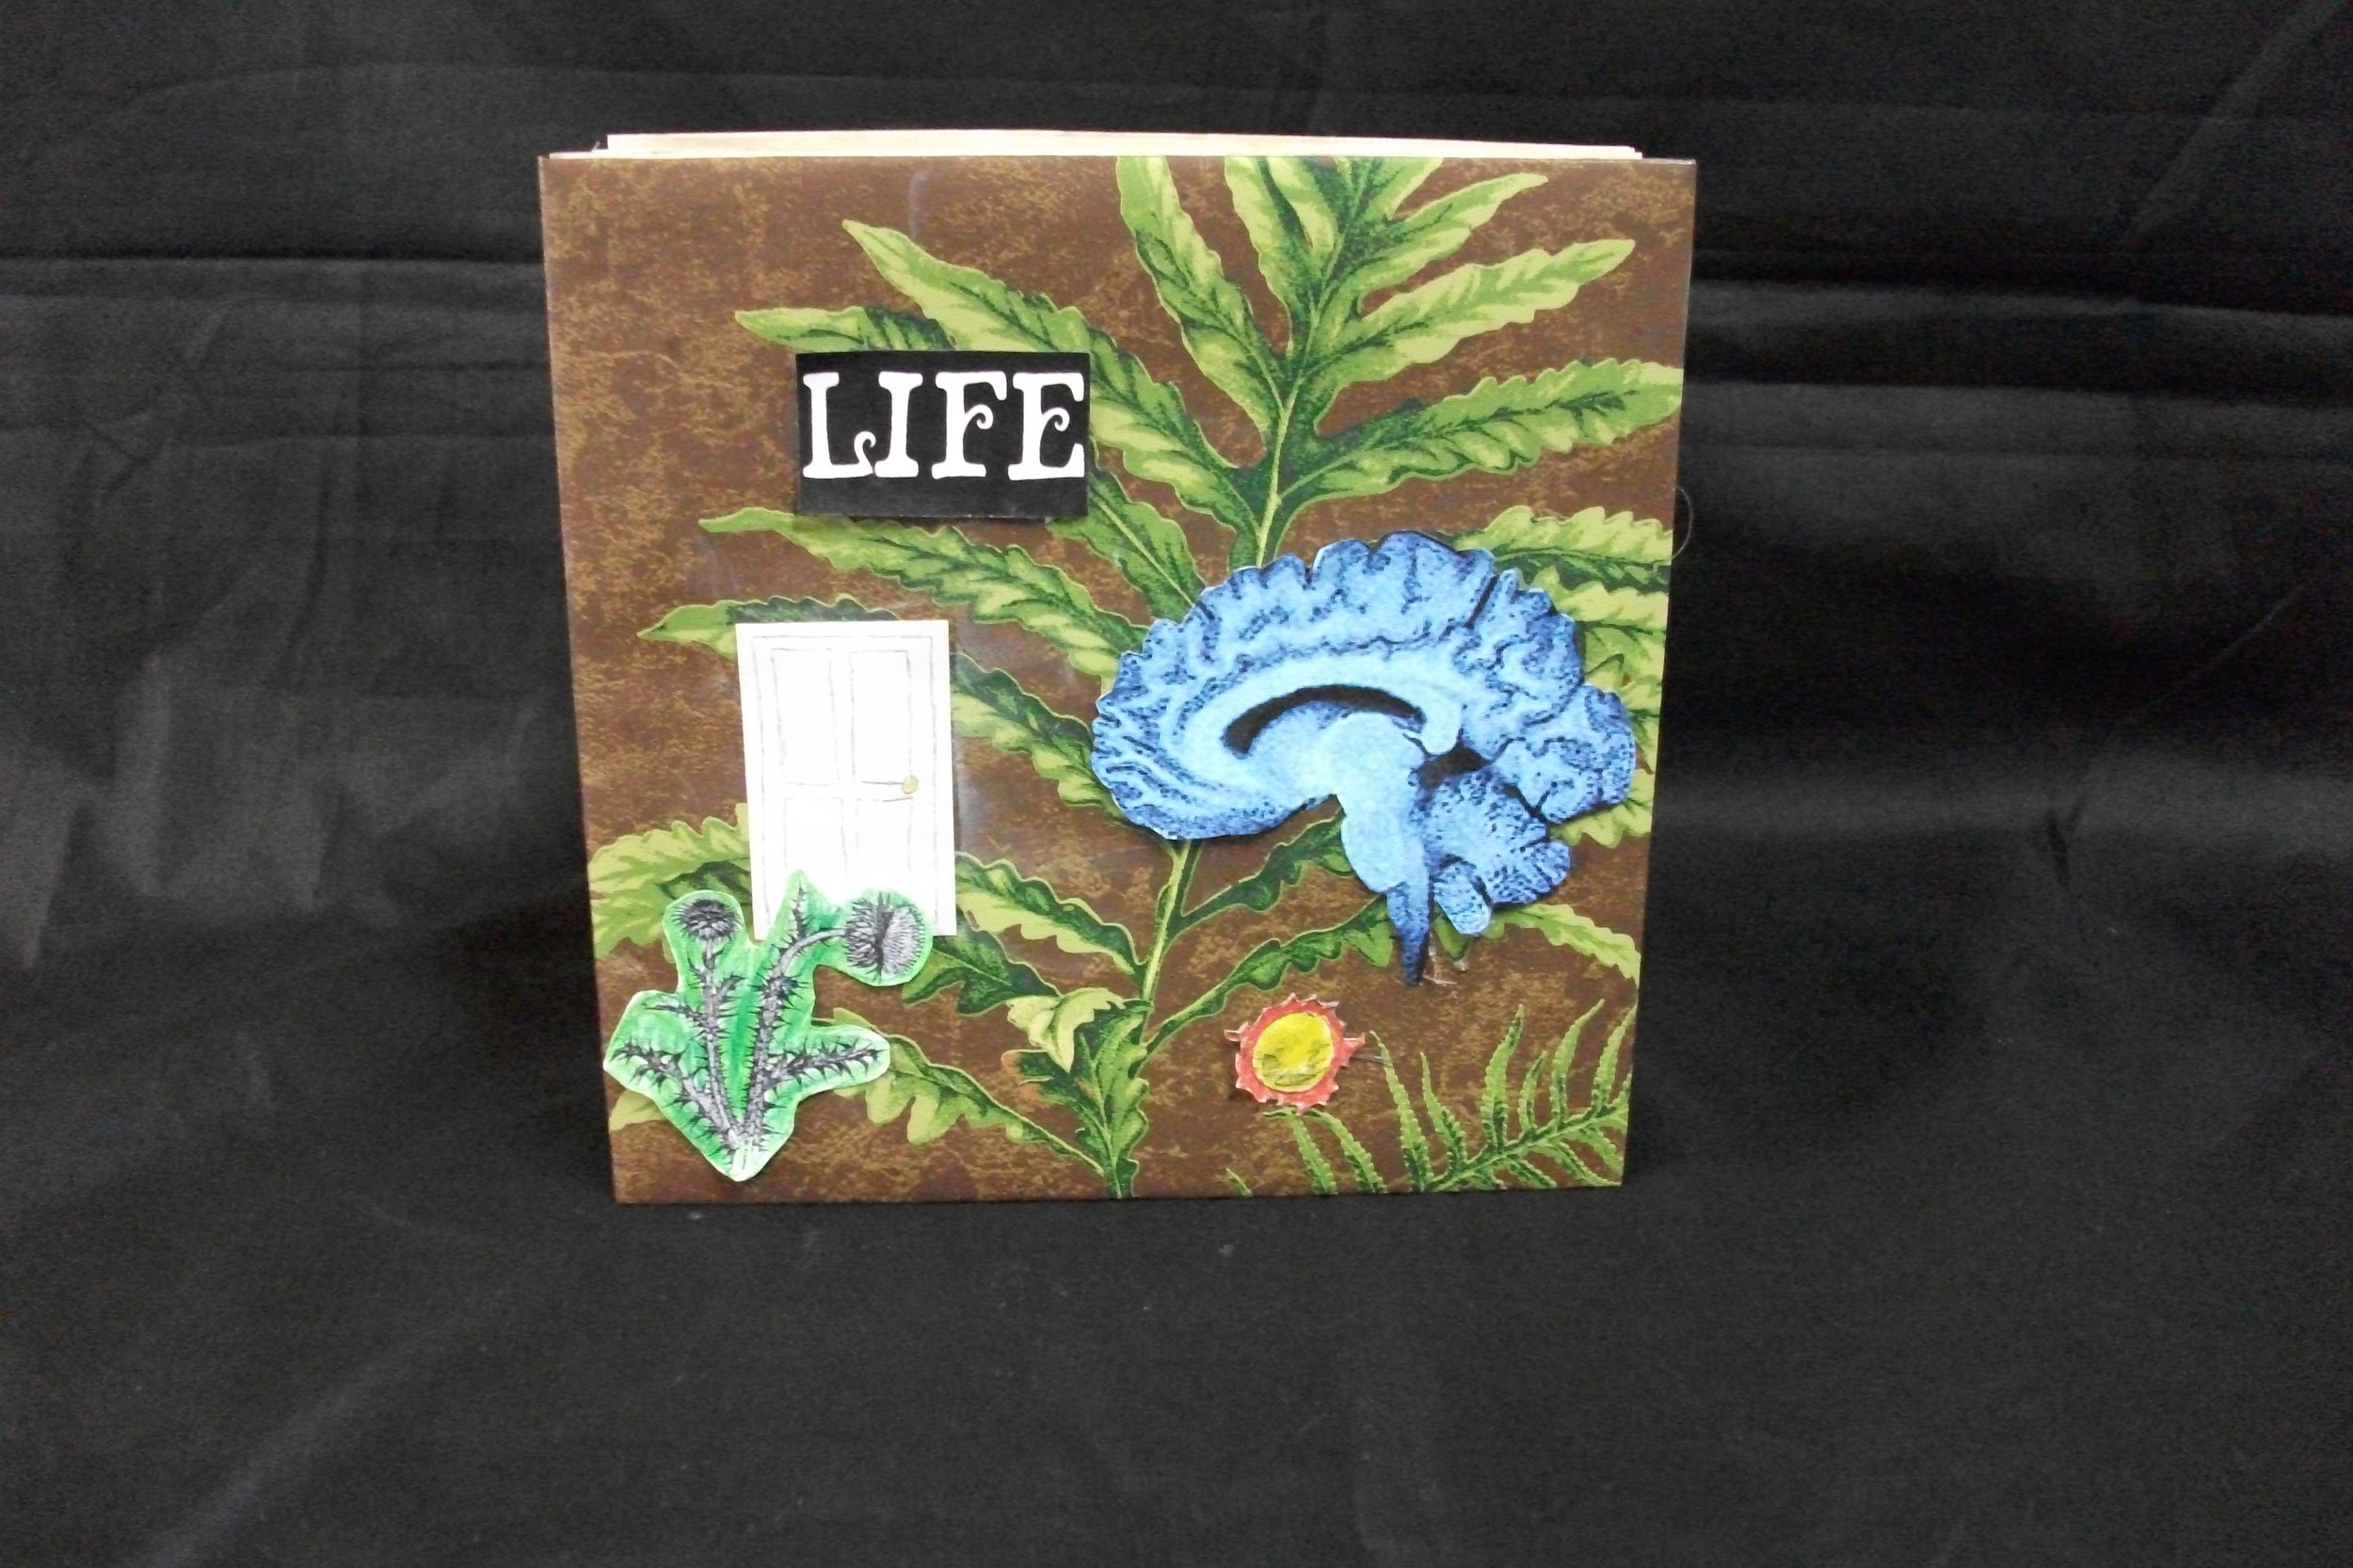 Matthew Stanbury, Life, paper, board, graphite, pastel, Prismacolor, 2010